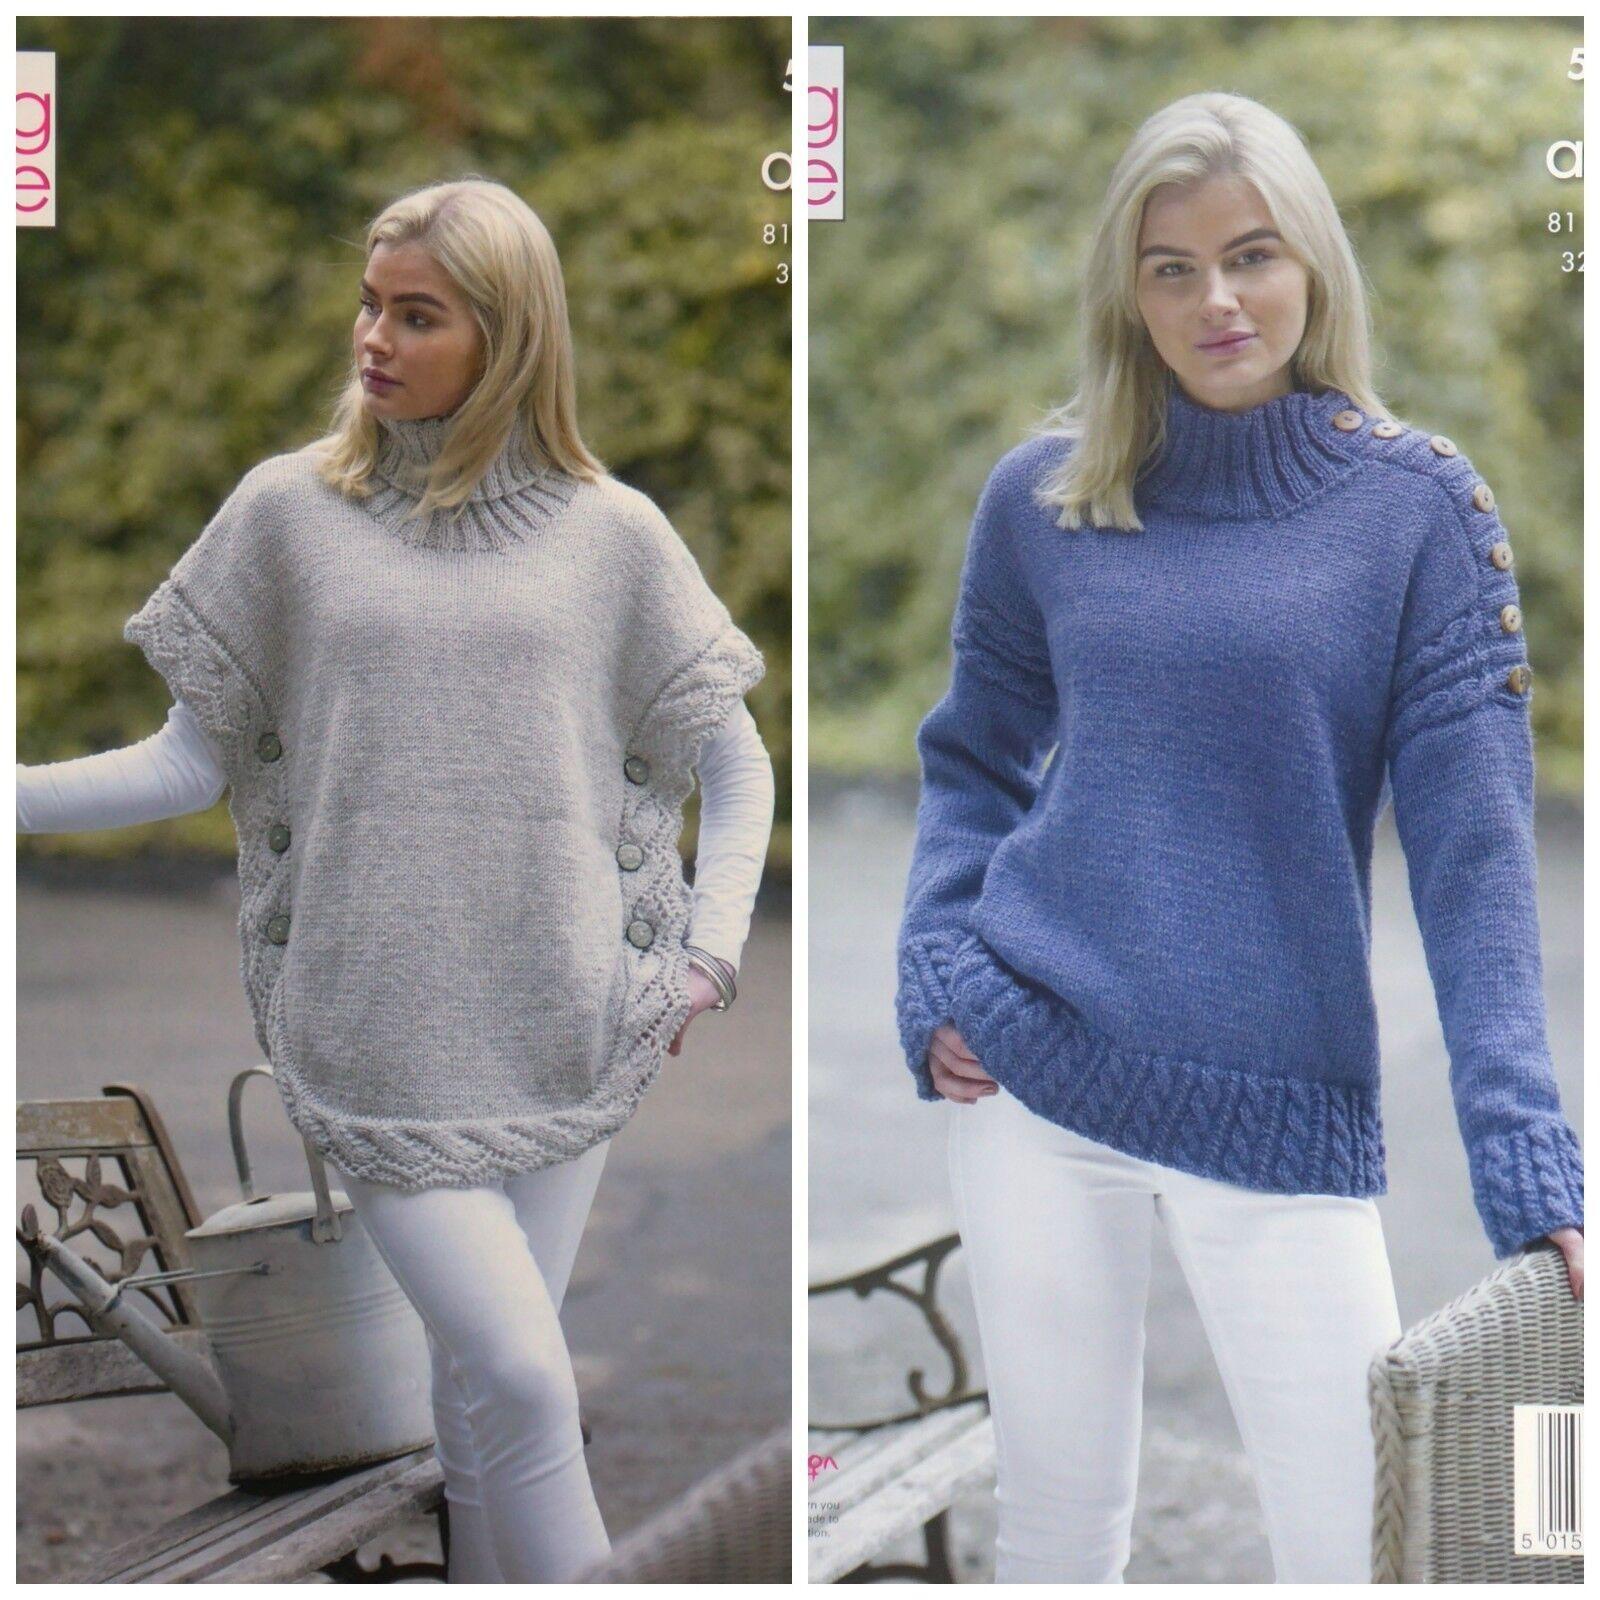 ae2e97cbc51e Womens Polo Neck Poncho   Sweater Ladies Knitting Pattern King Cole ...